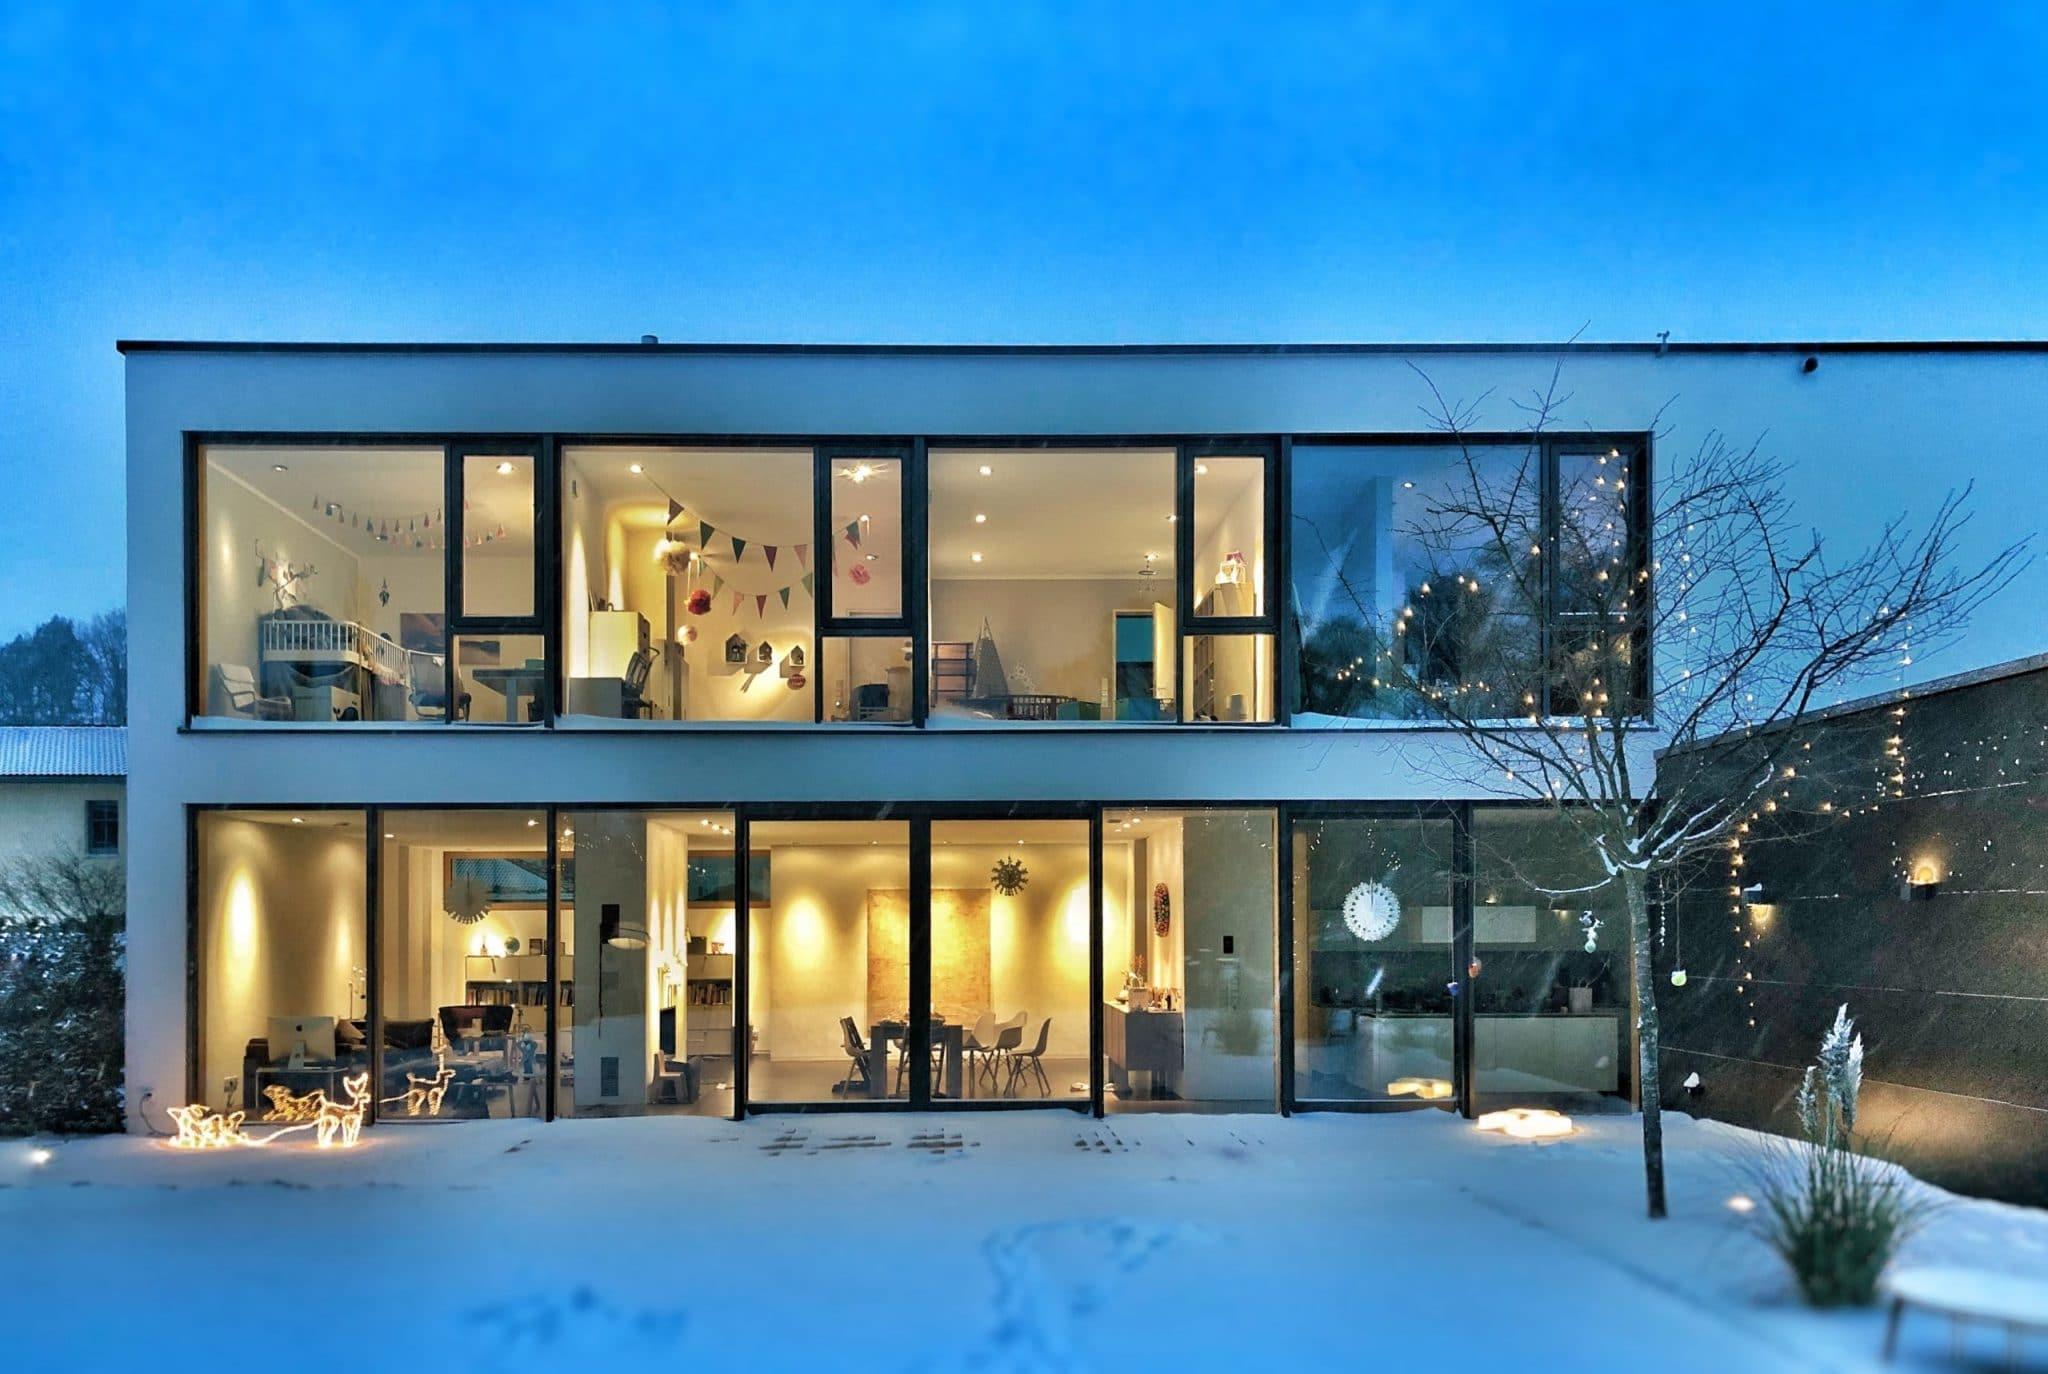 vivienda pasiva modular